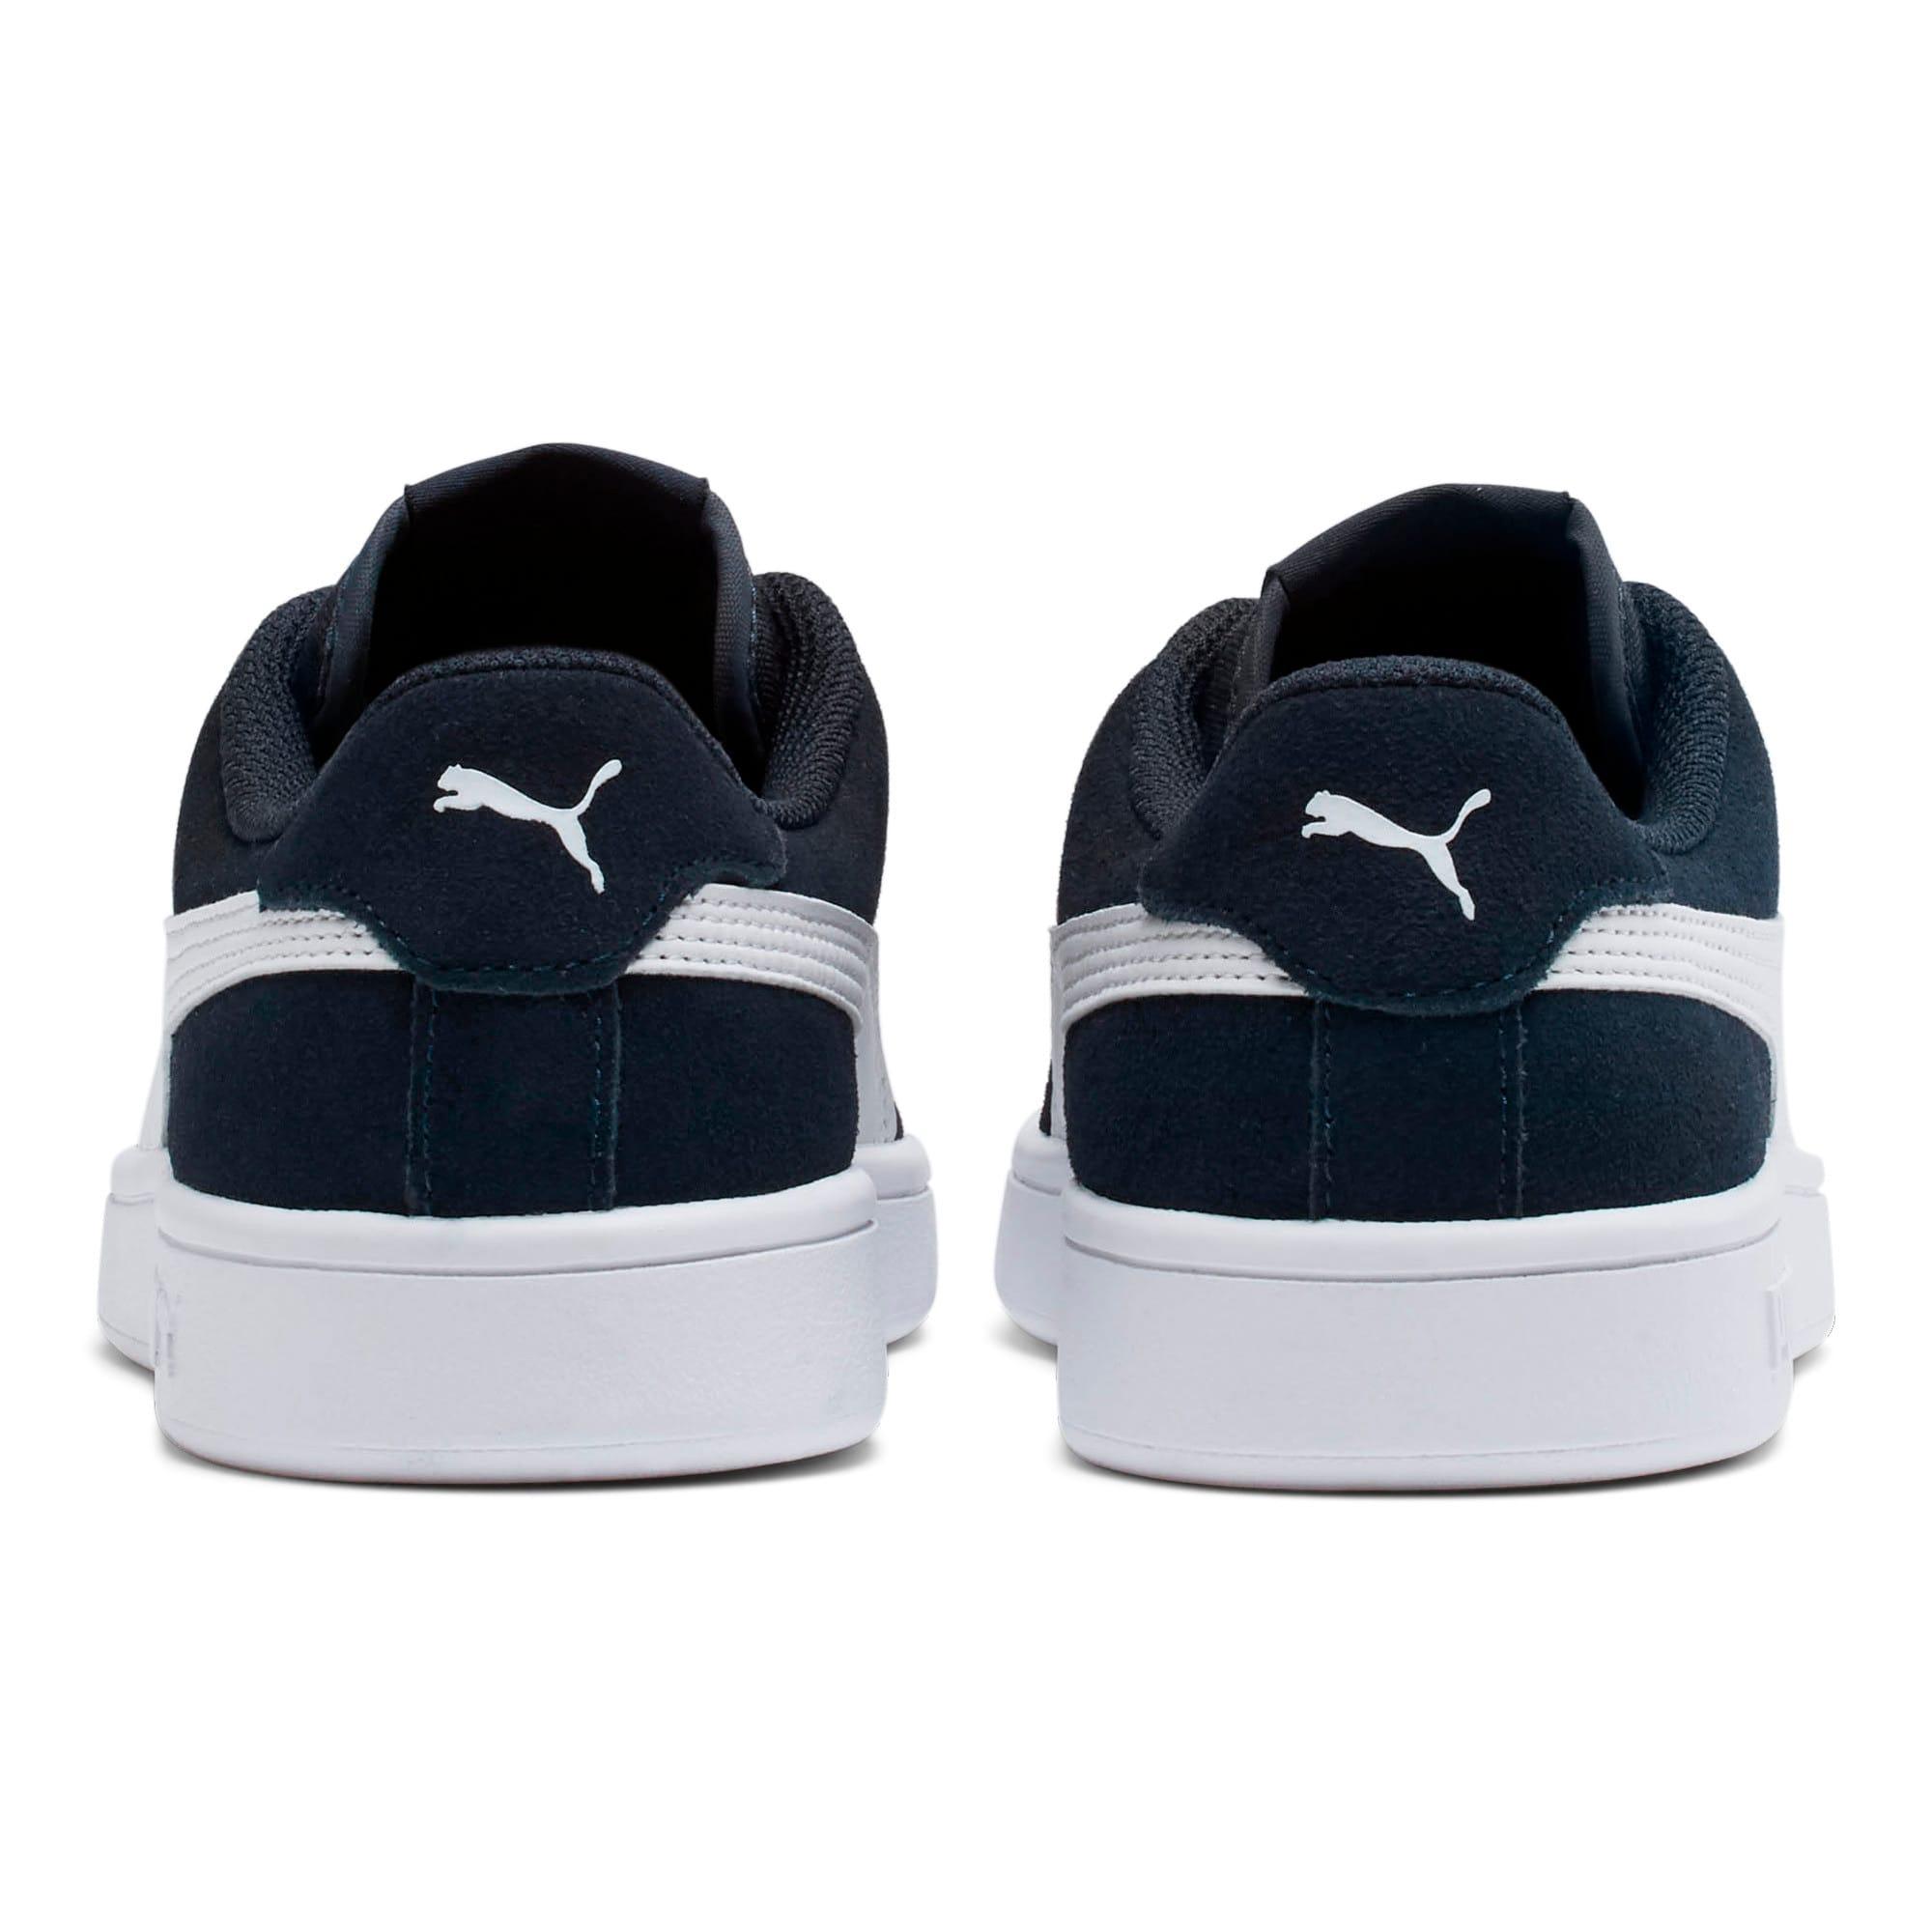 Thumbnail 4 of Smash v2 Suede Sneakers JR, Peacoat-Puma White, medium